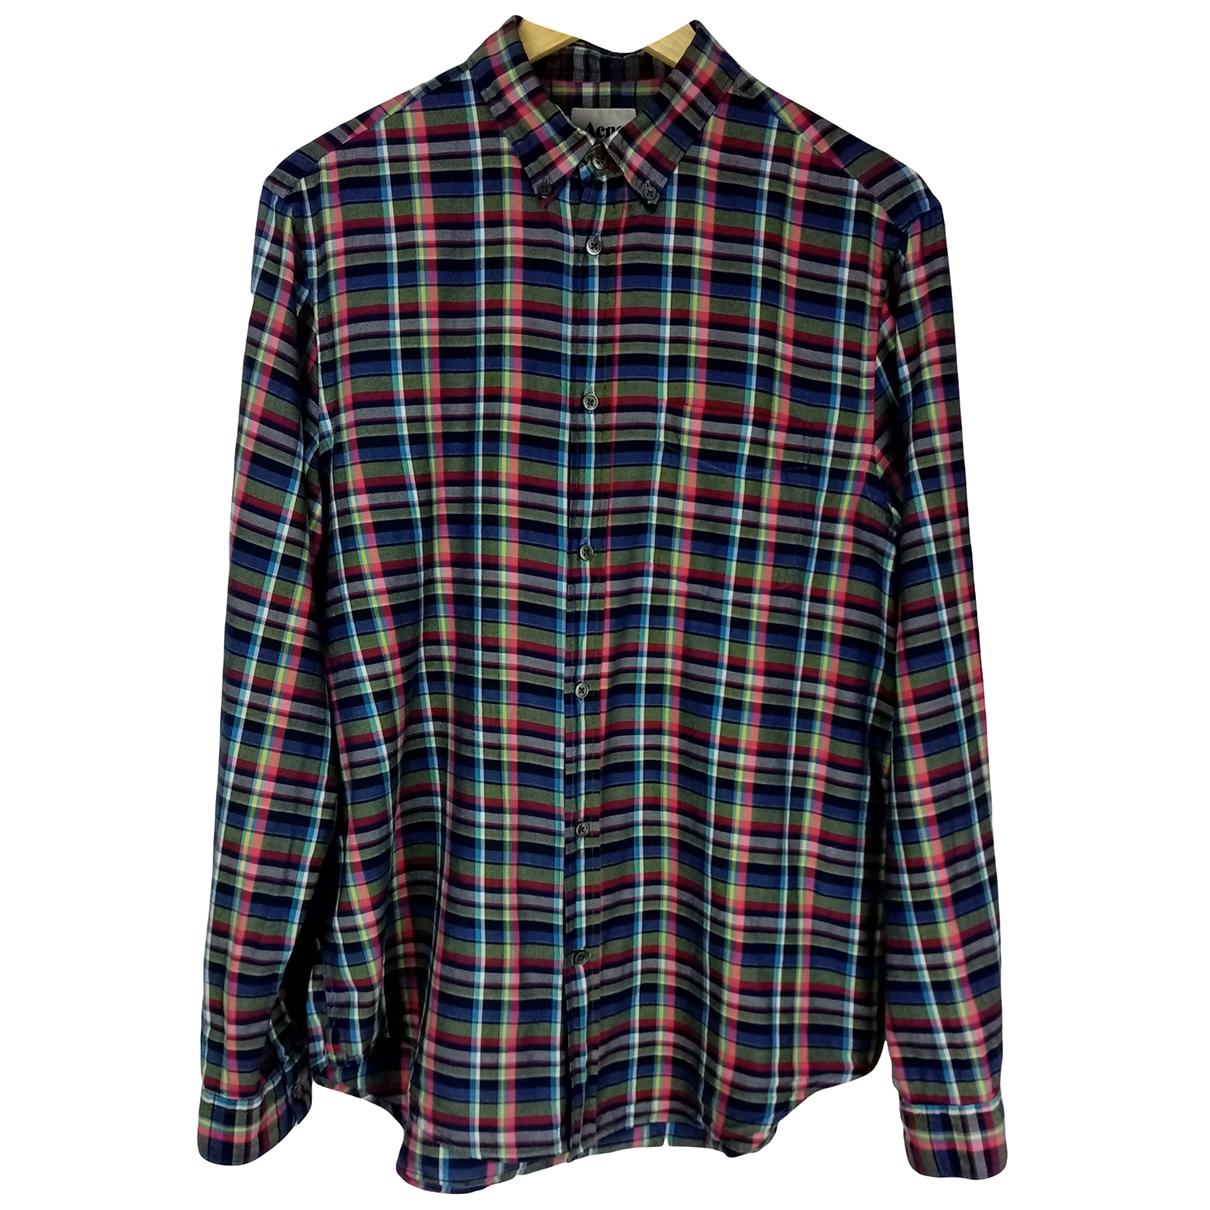 Acne Studios \N Multicolour Cotton Shirts for Men S International